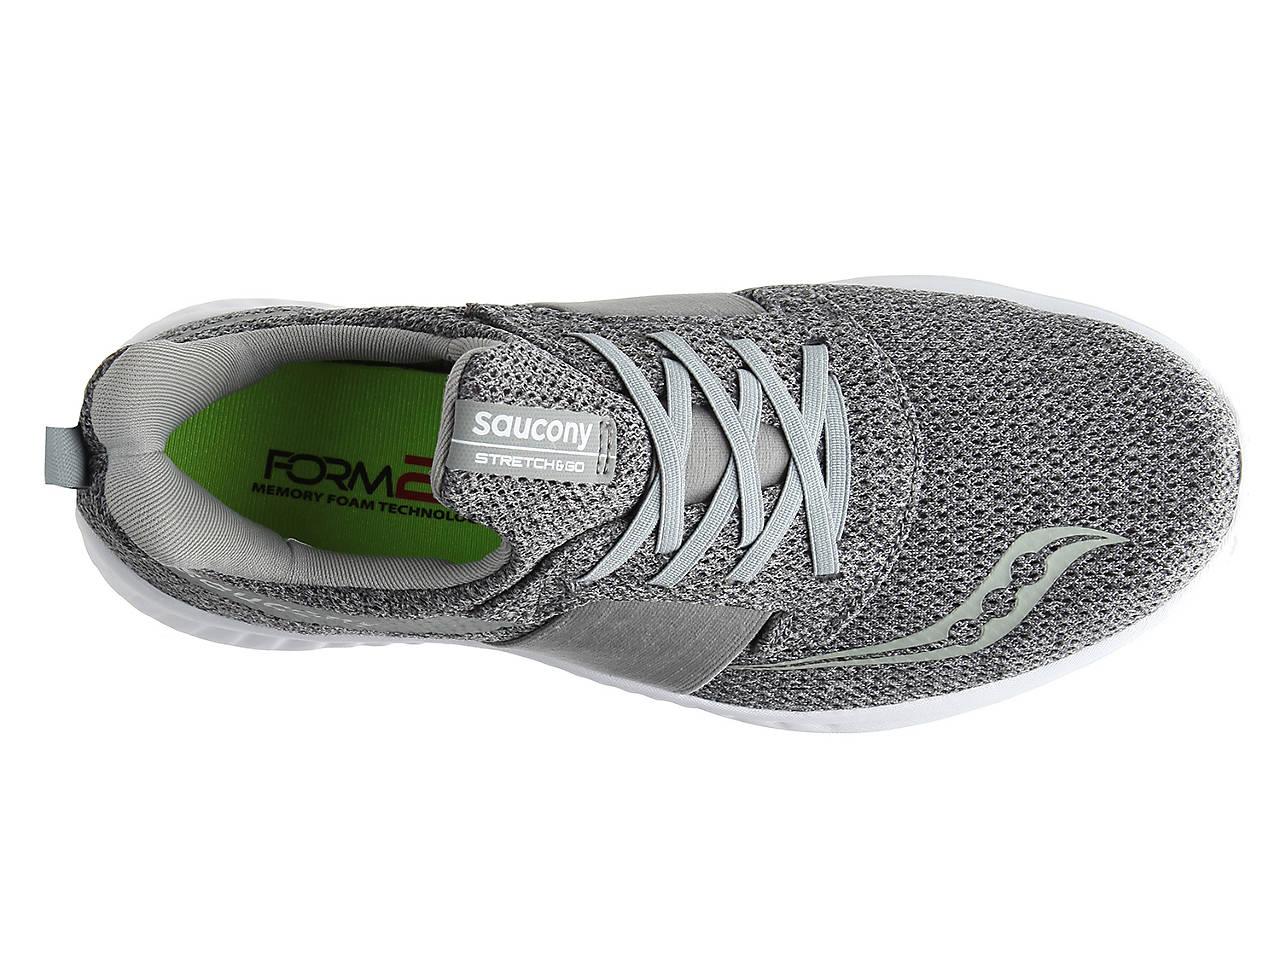 7d2762c8c9 Stretch & Go Breeze Lightweight Slip-On Running Shoe - Men's